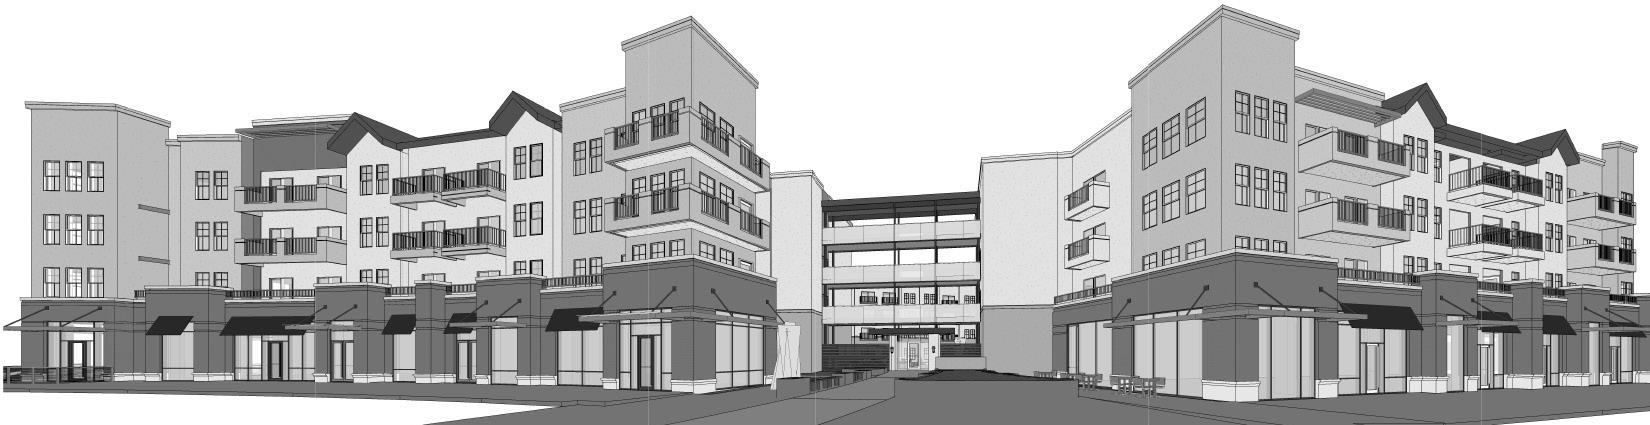 Hyder Wins 21 Fitzsimons Apartment Renovation Phase II   December 13, 2016